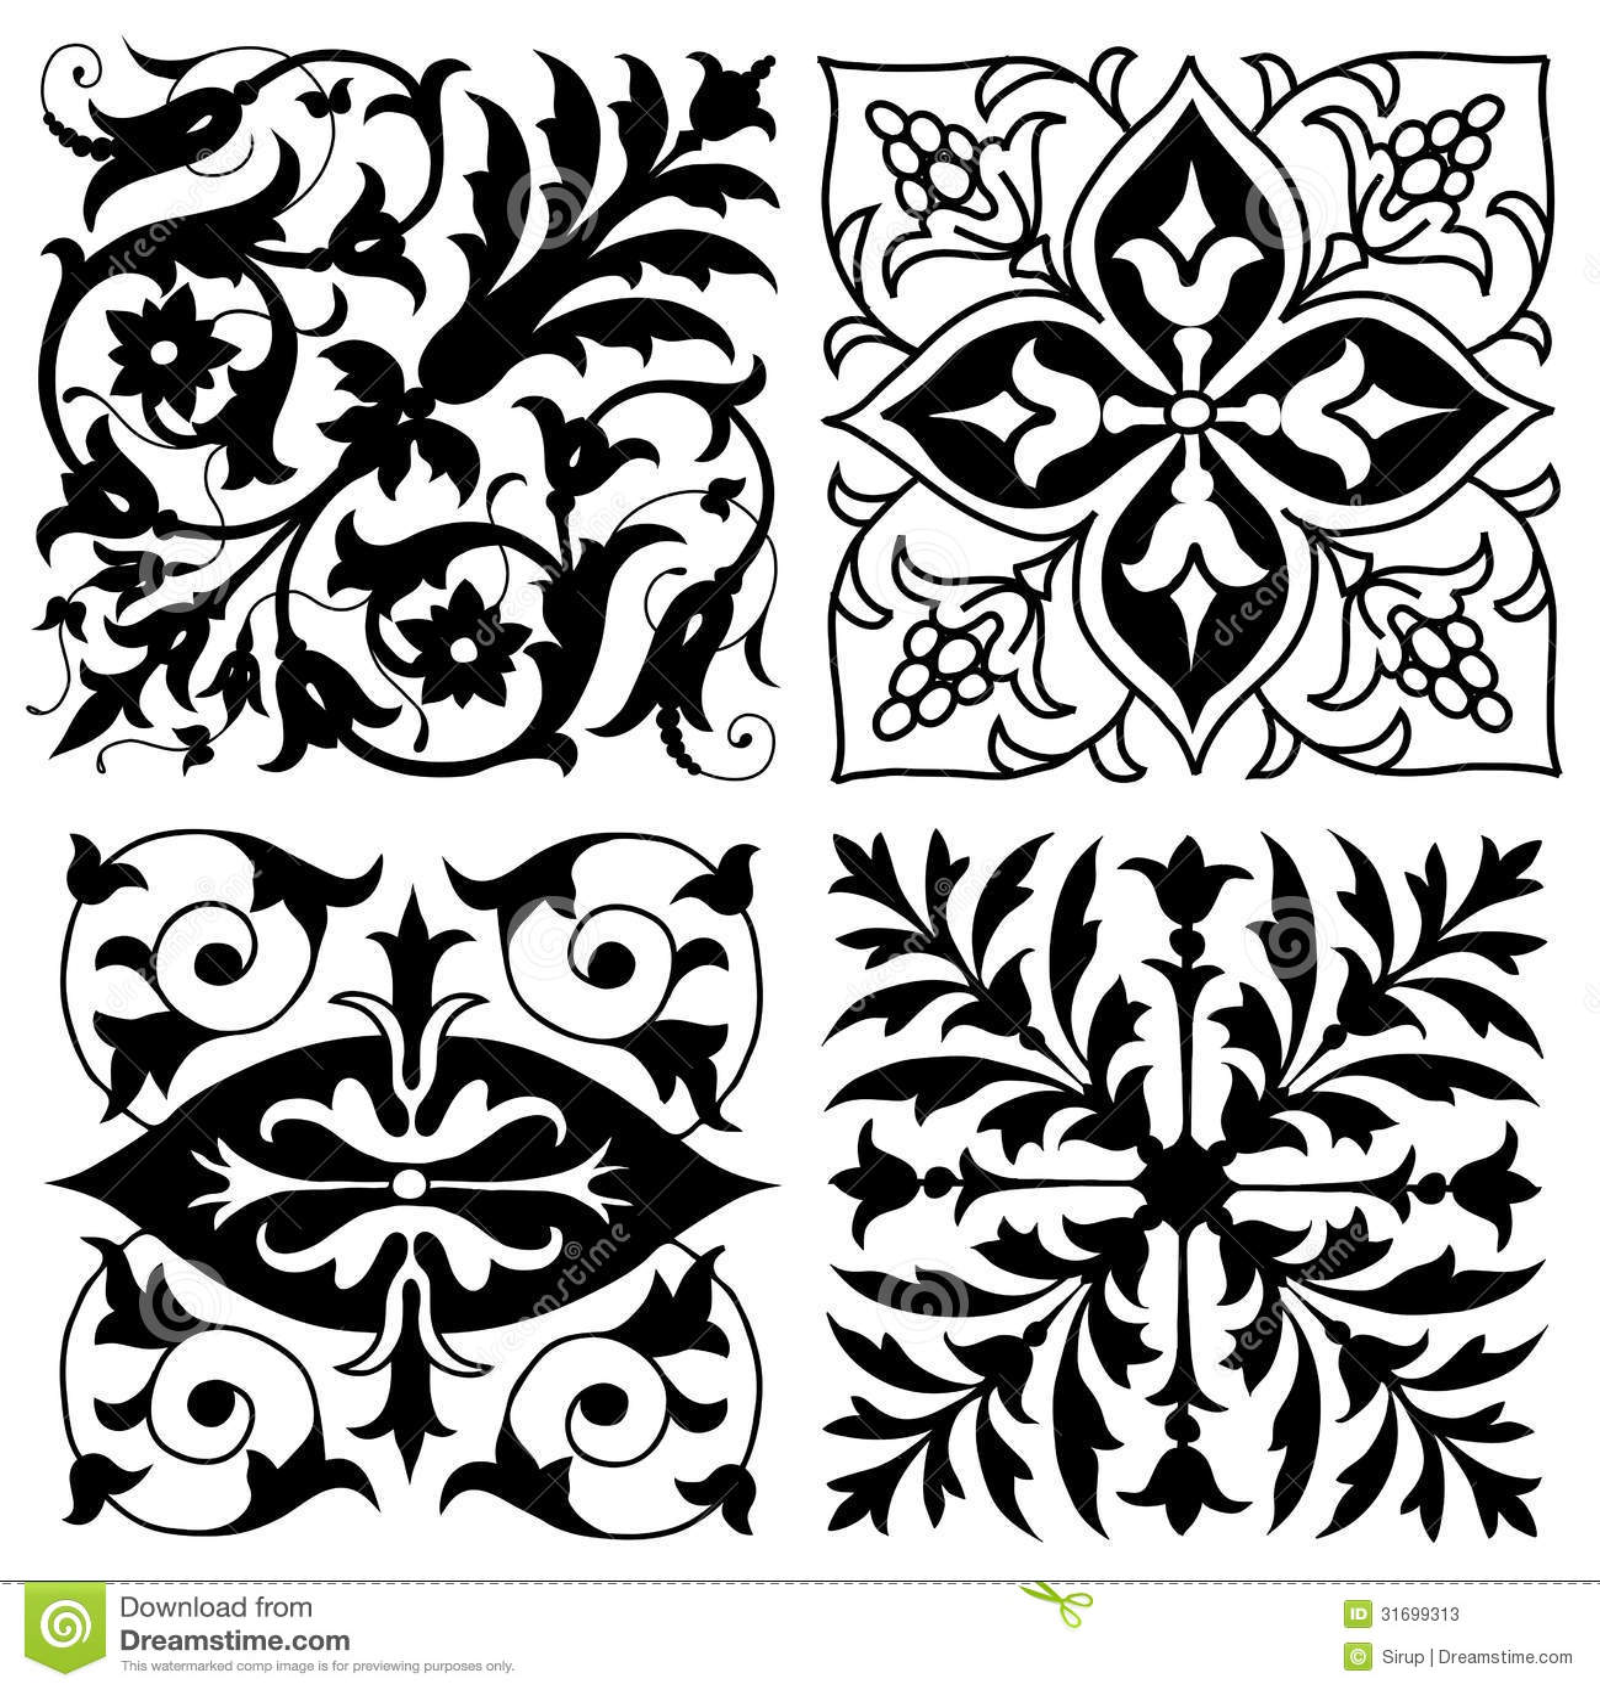 Four Vintage Foliate Ornament Designs Stock Photos - Image ...